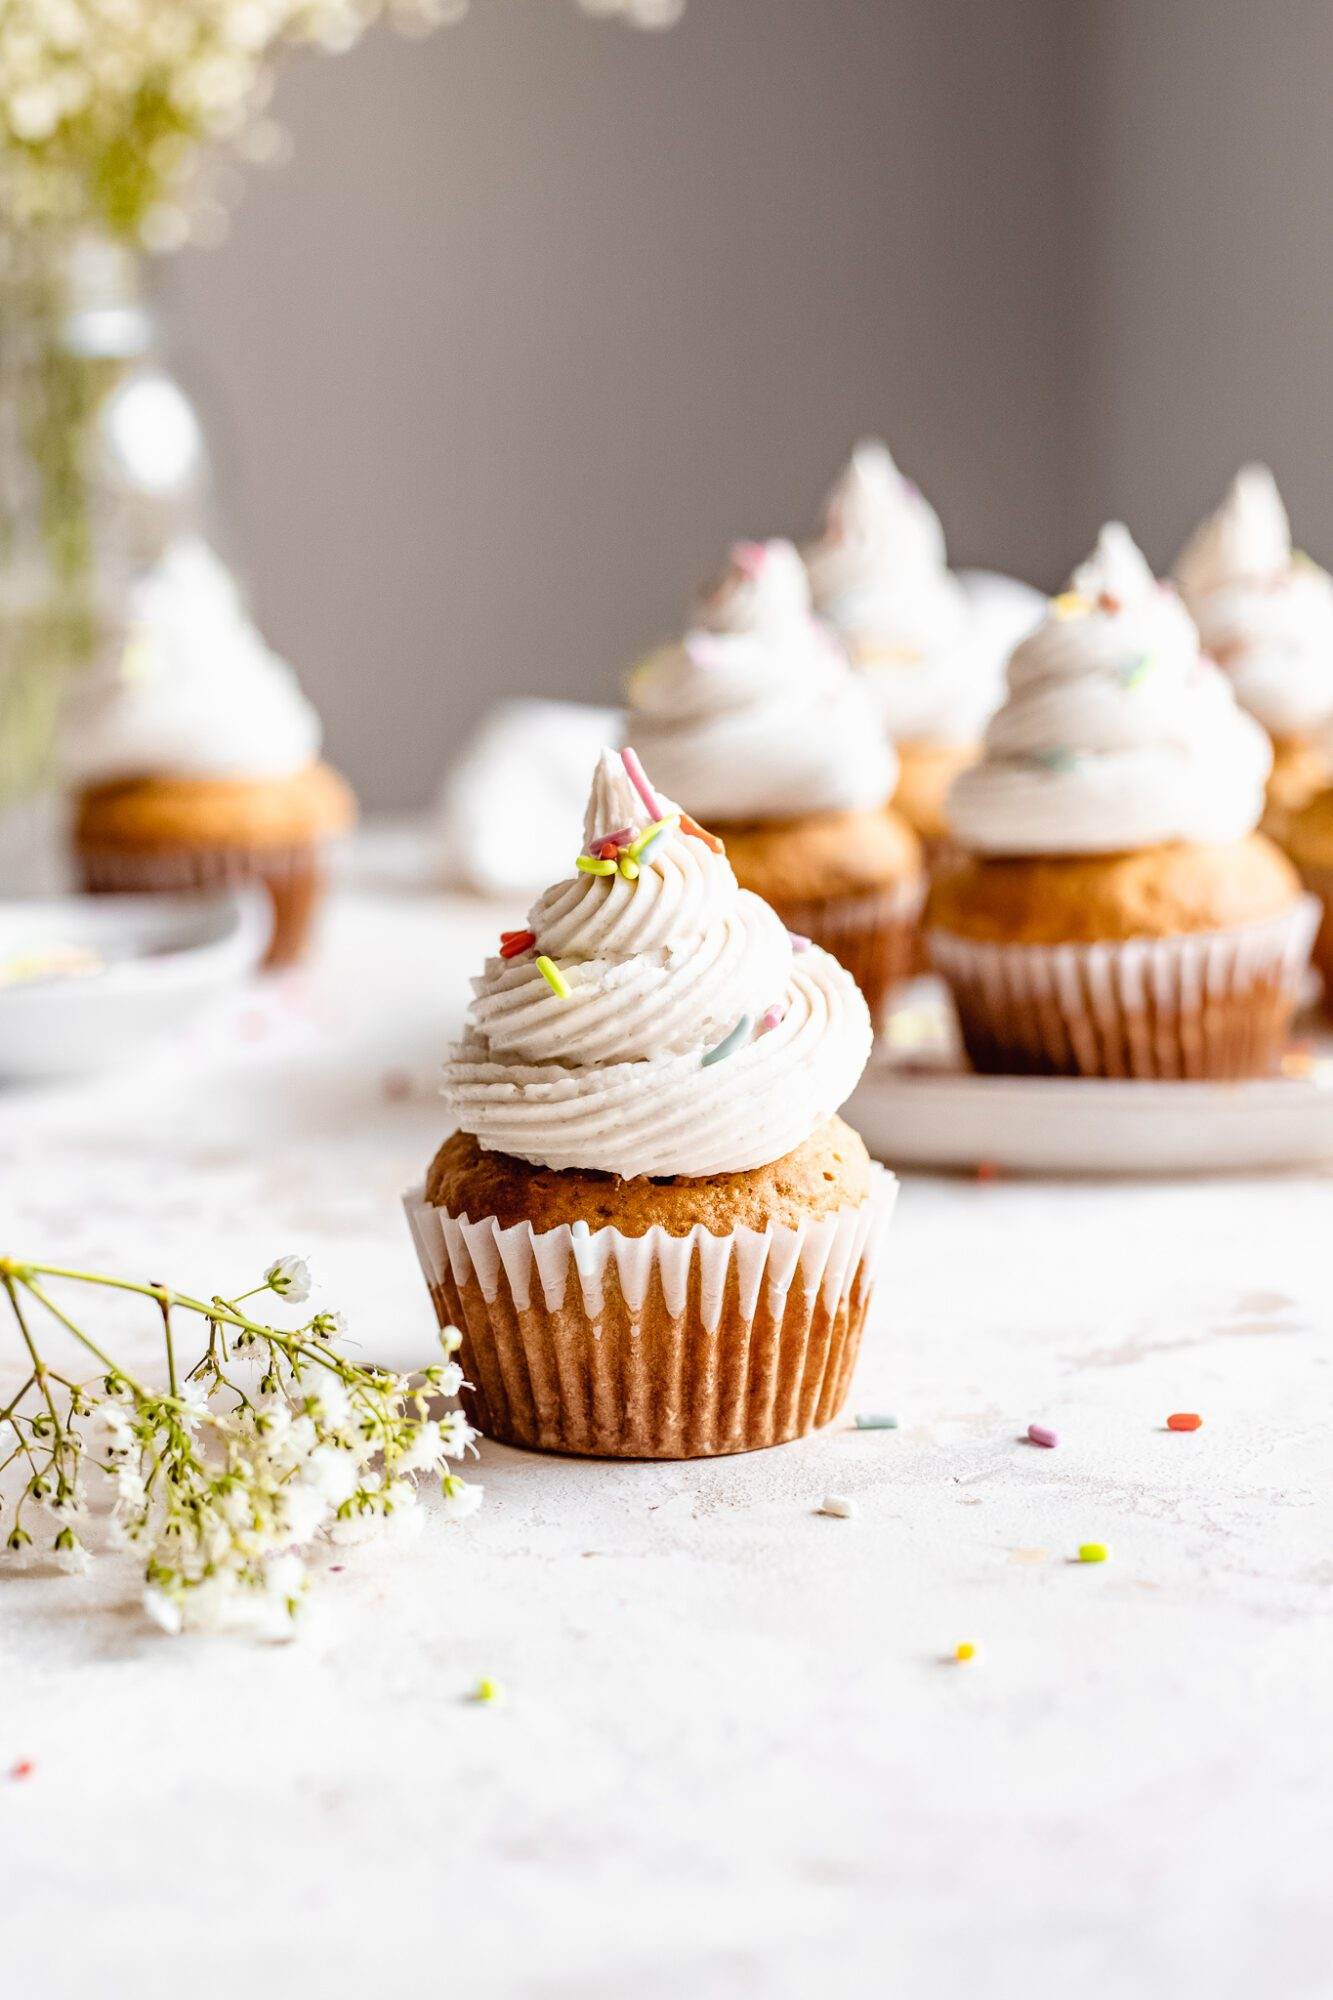 vegan cupcake with sprinkles